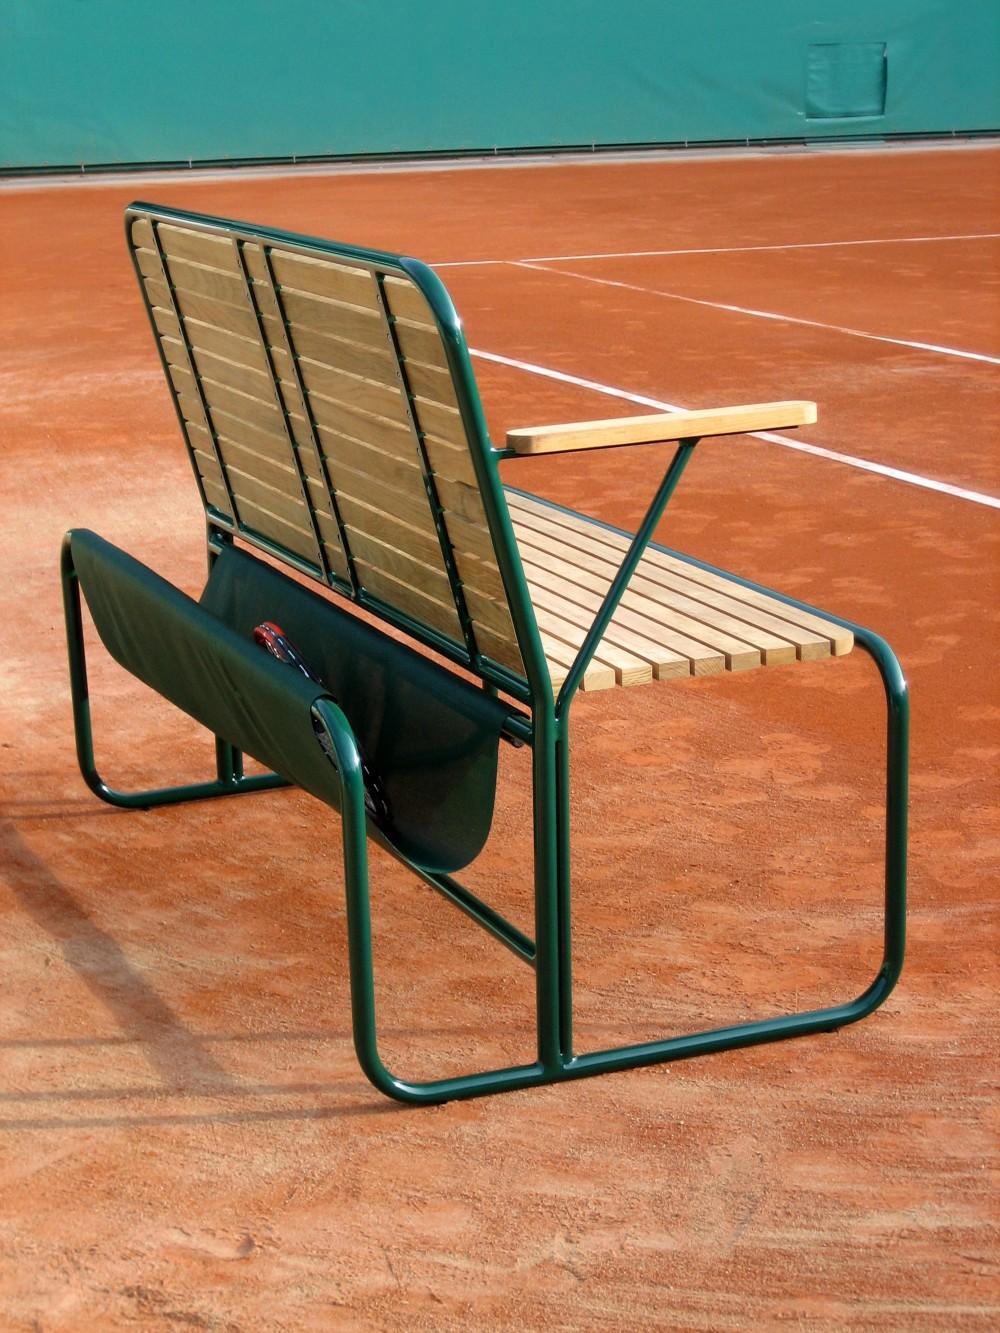 Tennis - © Pierre Charpin